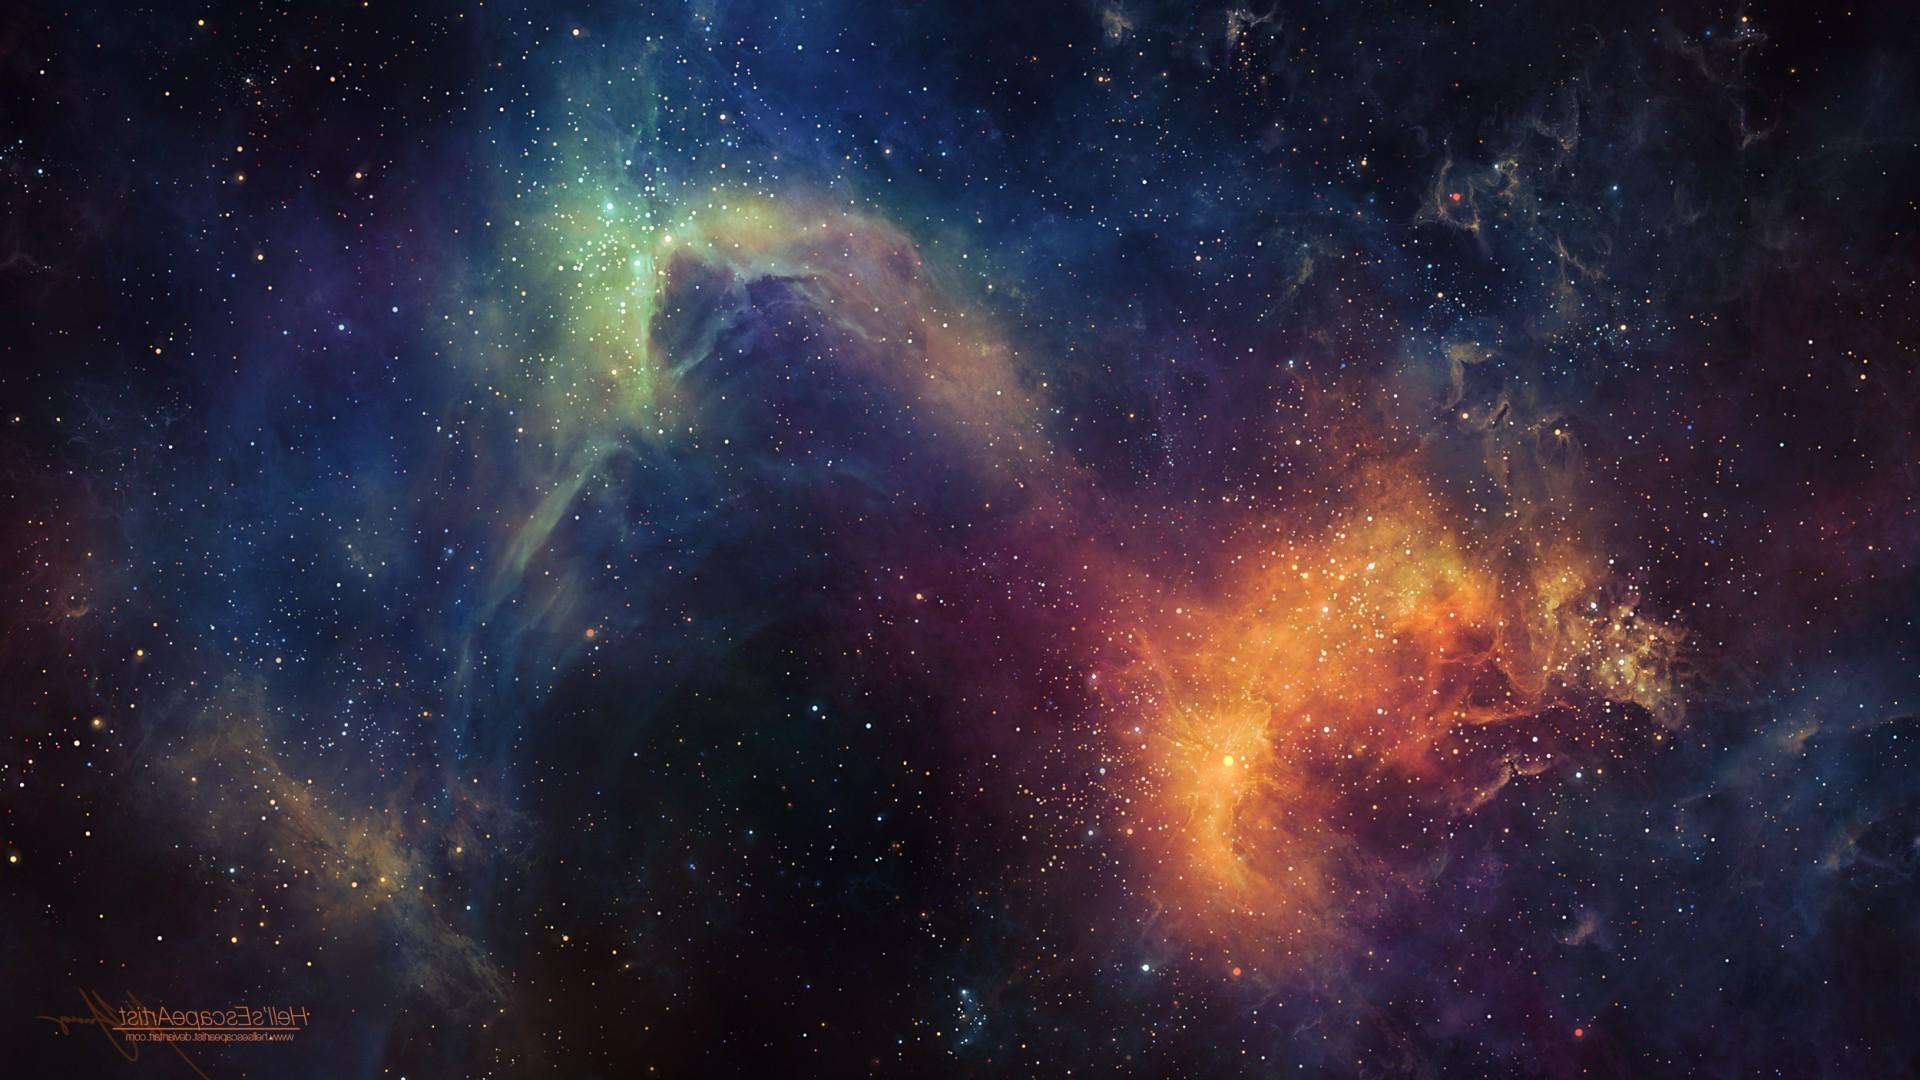 space Art, Nebula, Space, TylerCreatesWorlds